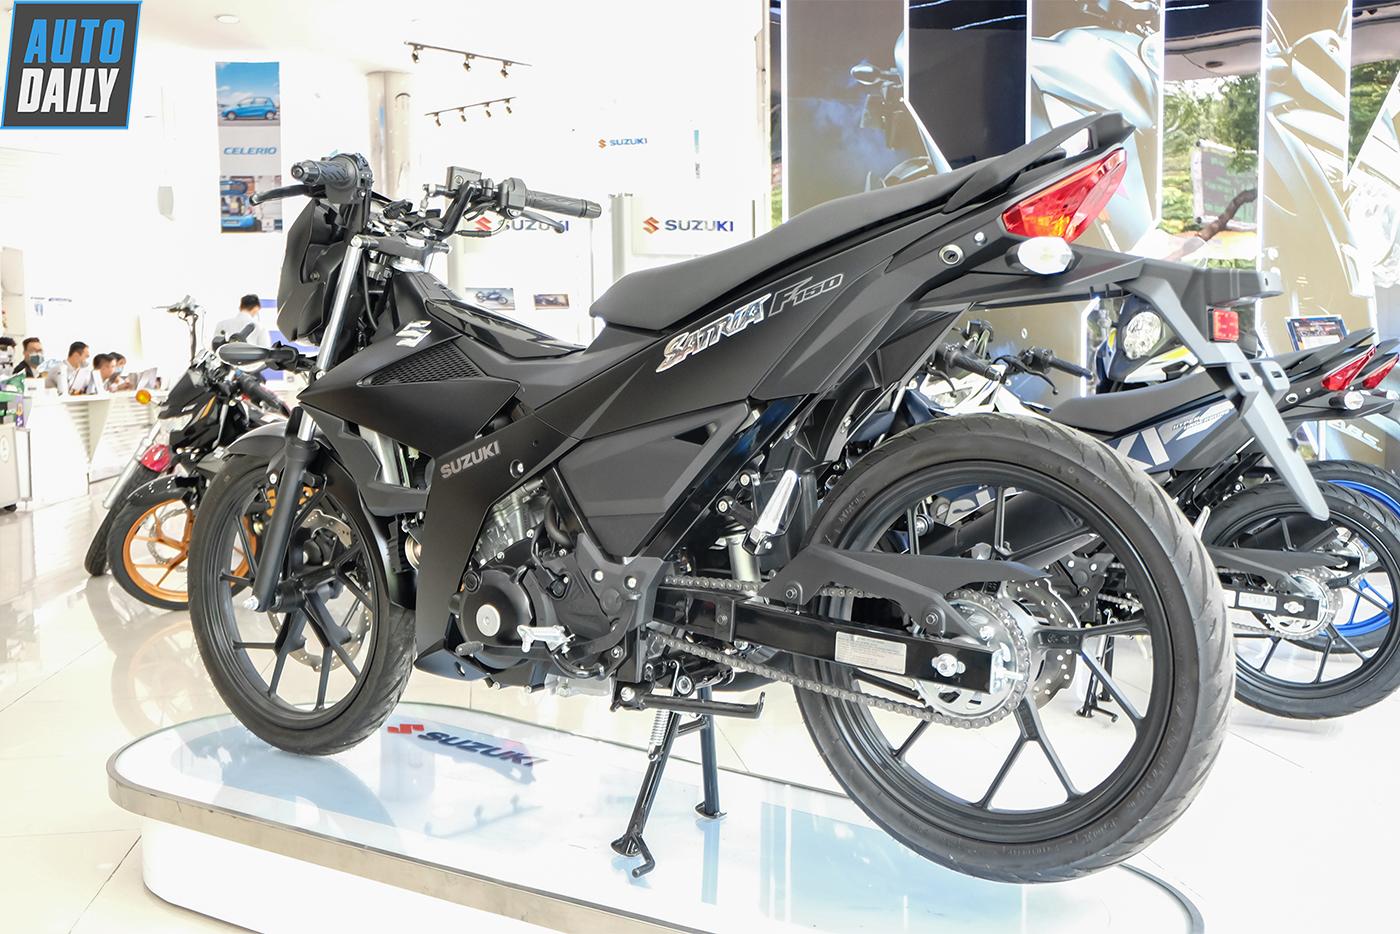 Chi tiết Suzuki Satria F150 nhập chính hãng có giá từ 51,99 triệu đồng suzuki-satria-f150-26.jpg